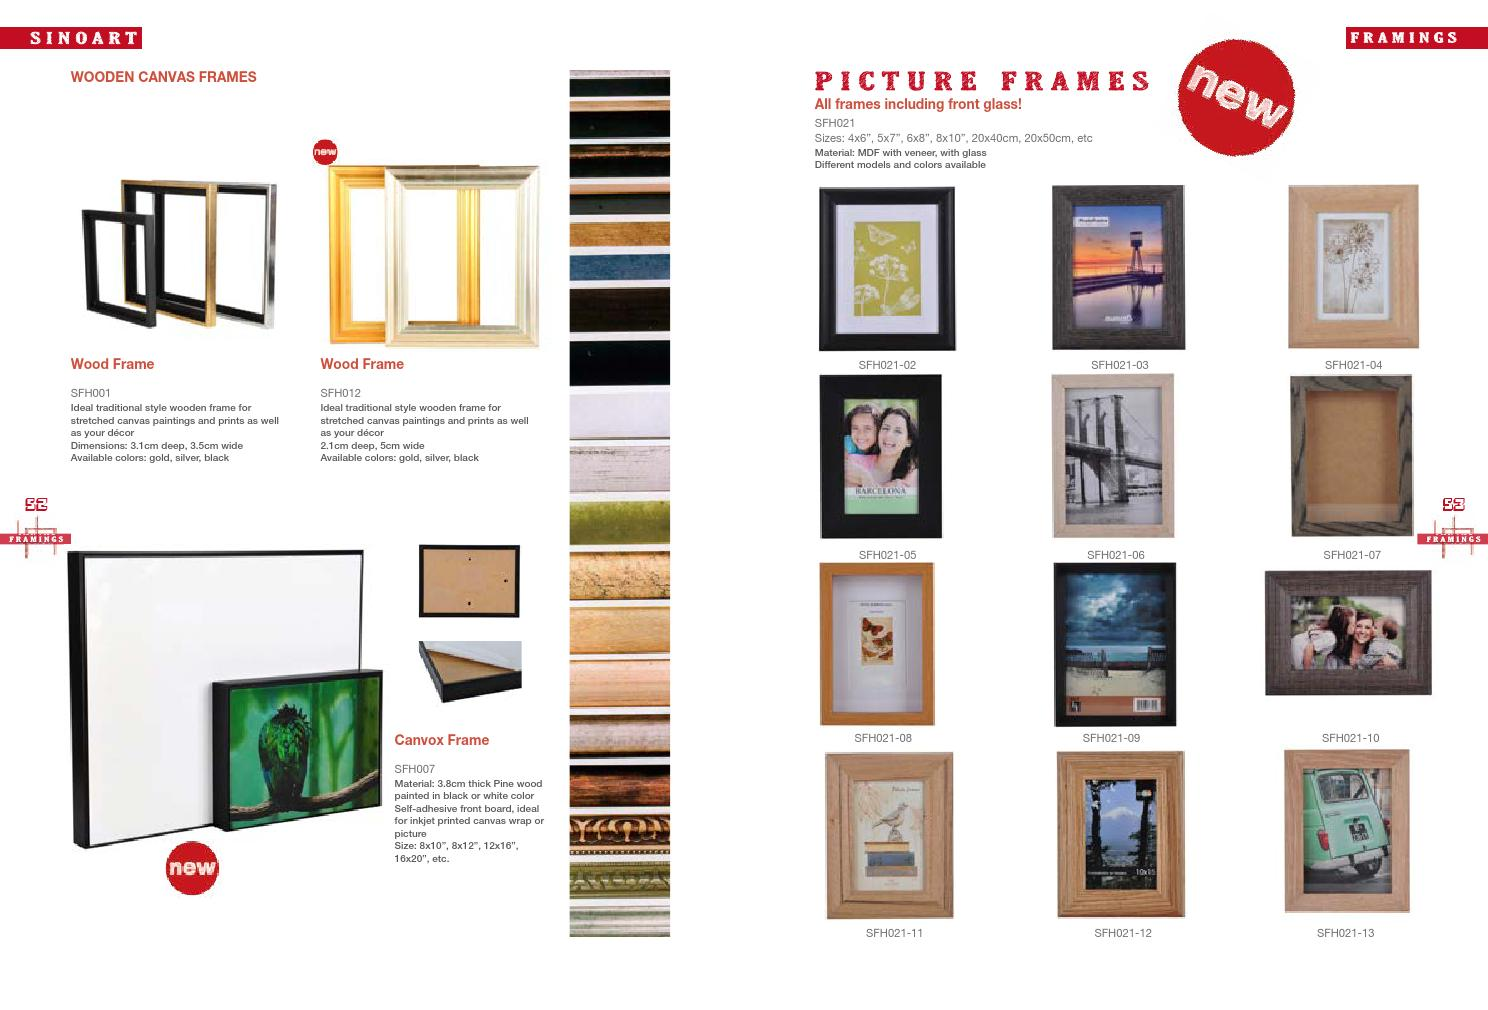 Sinoart Catalogue 2015 by SINOART Shanghai co ,Ltd - issuu